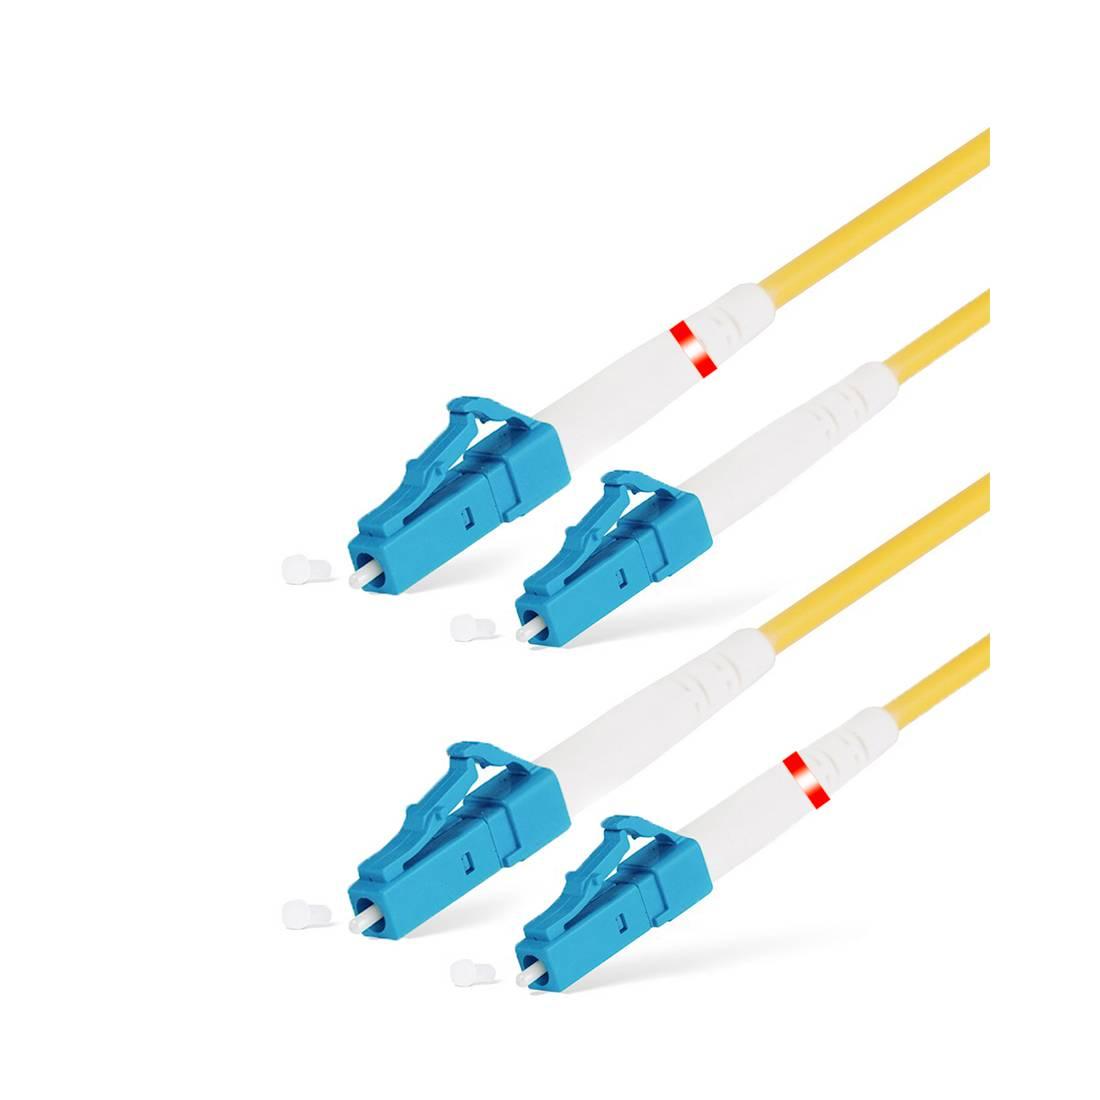 Шнур оптический (патч-корд) 2-LC 9-7